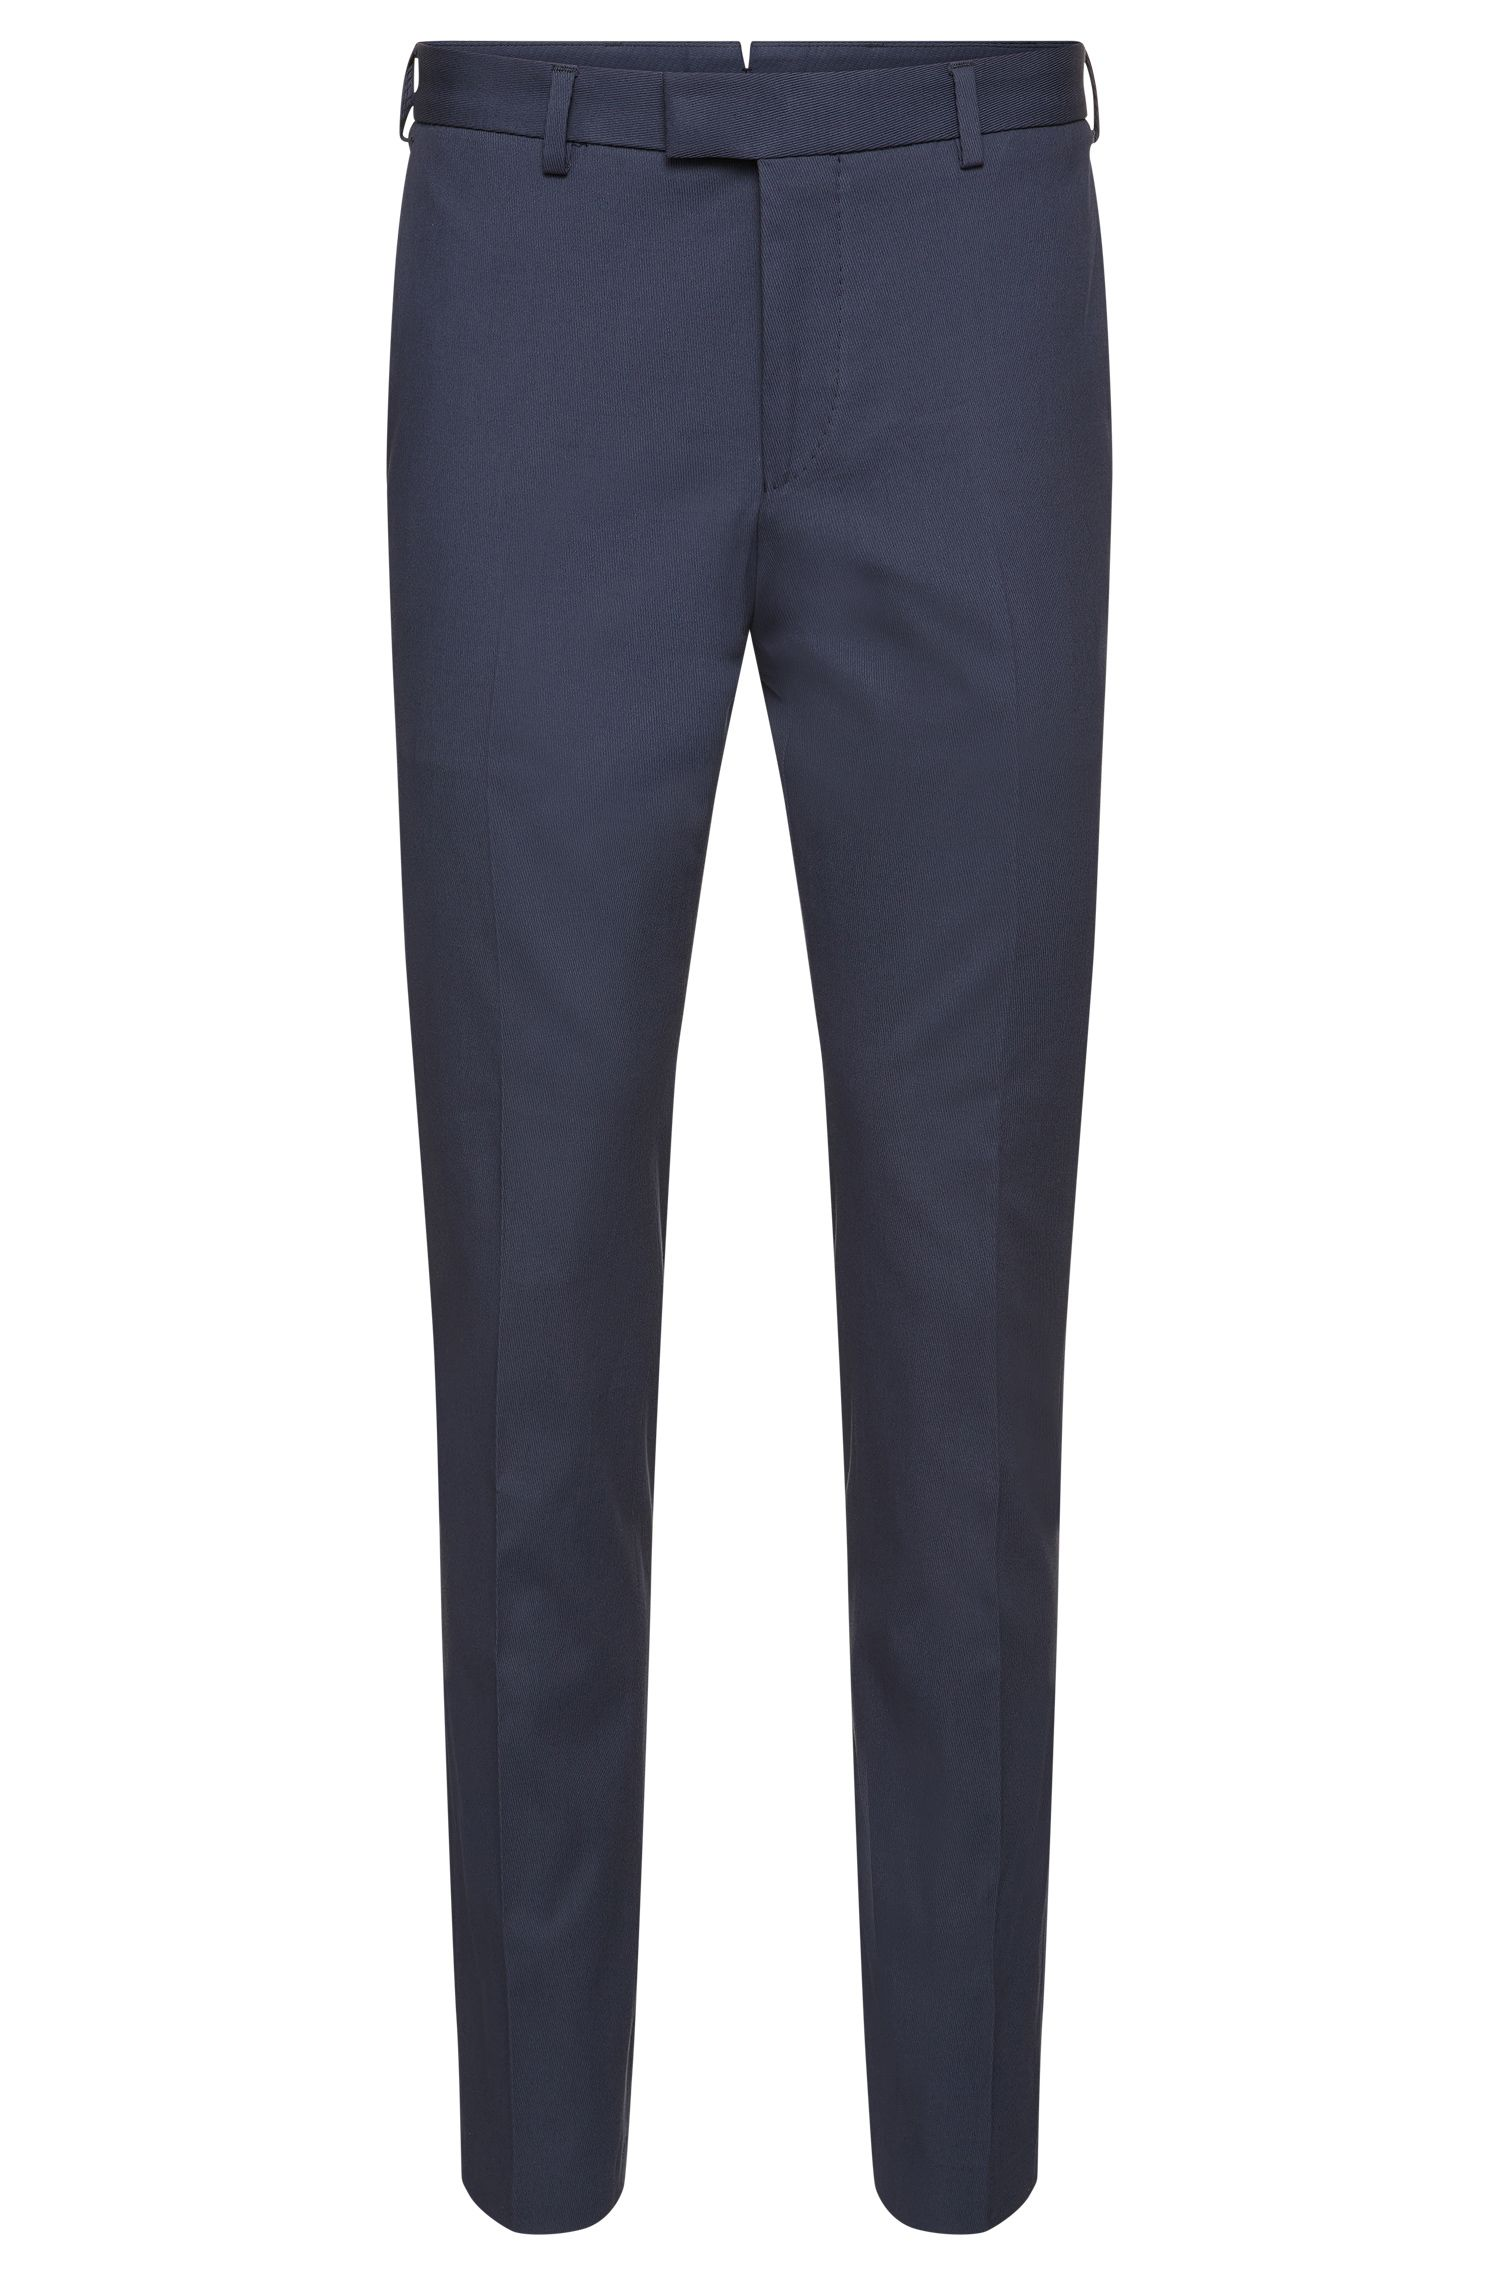 Pantalón slim fit Tailored en algodón elástico de canalé fino: 'T-Bak'